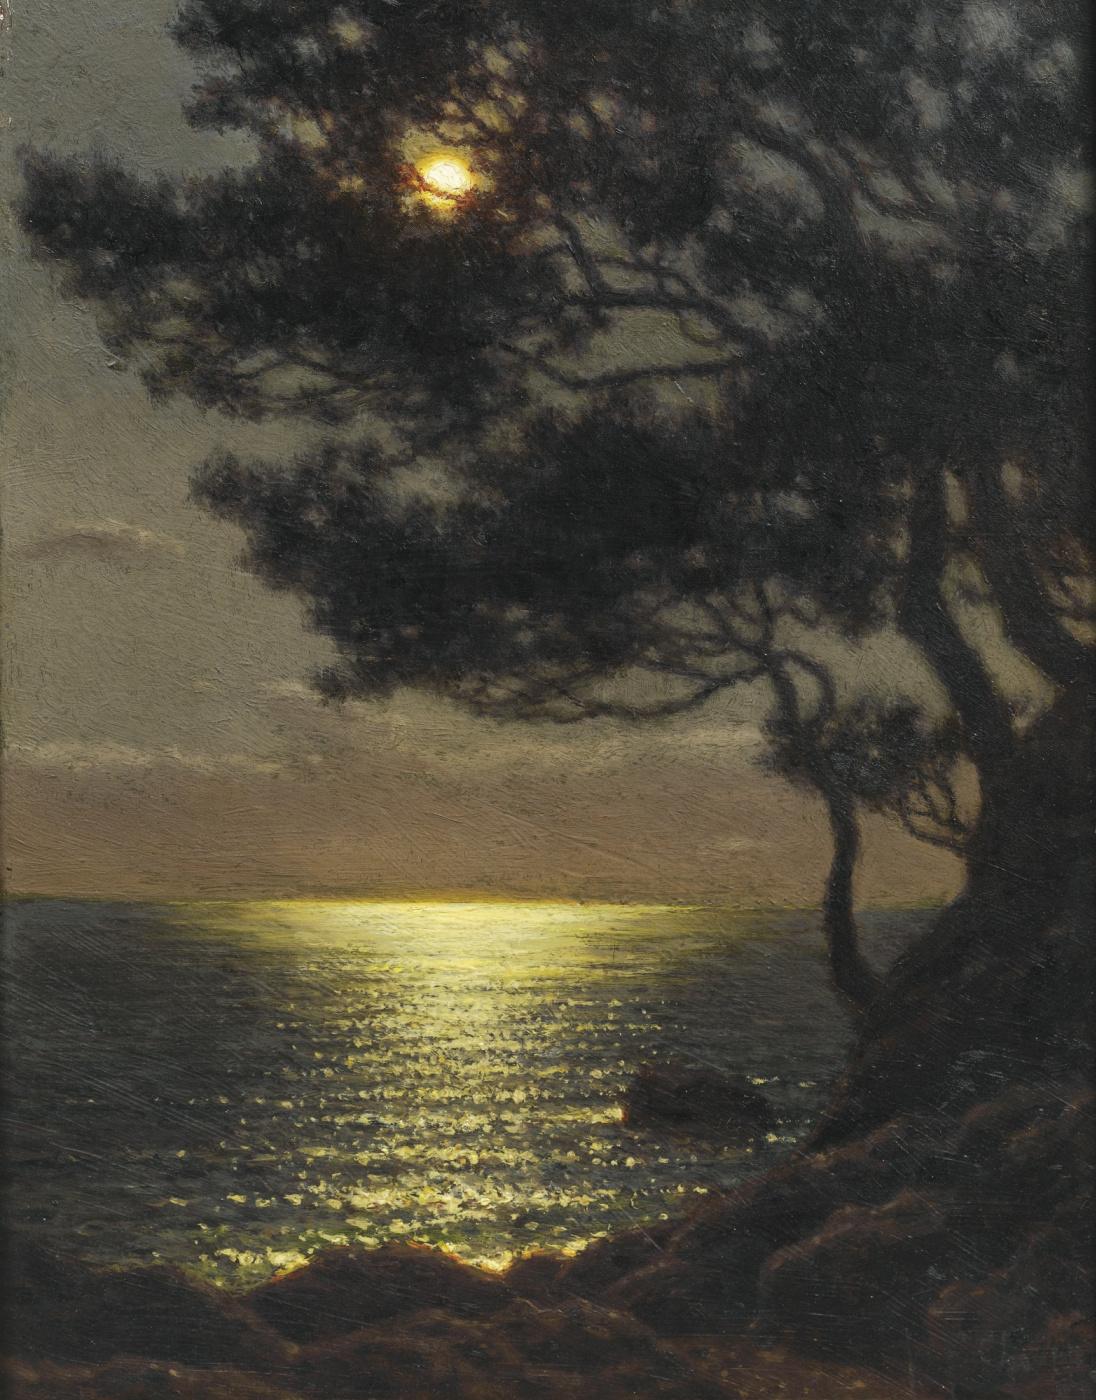 Ivan Choultsé. The coast in the moonlight